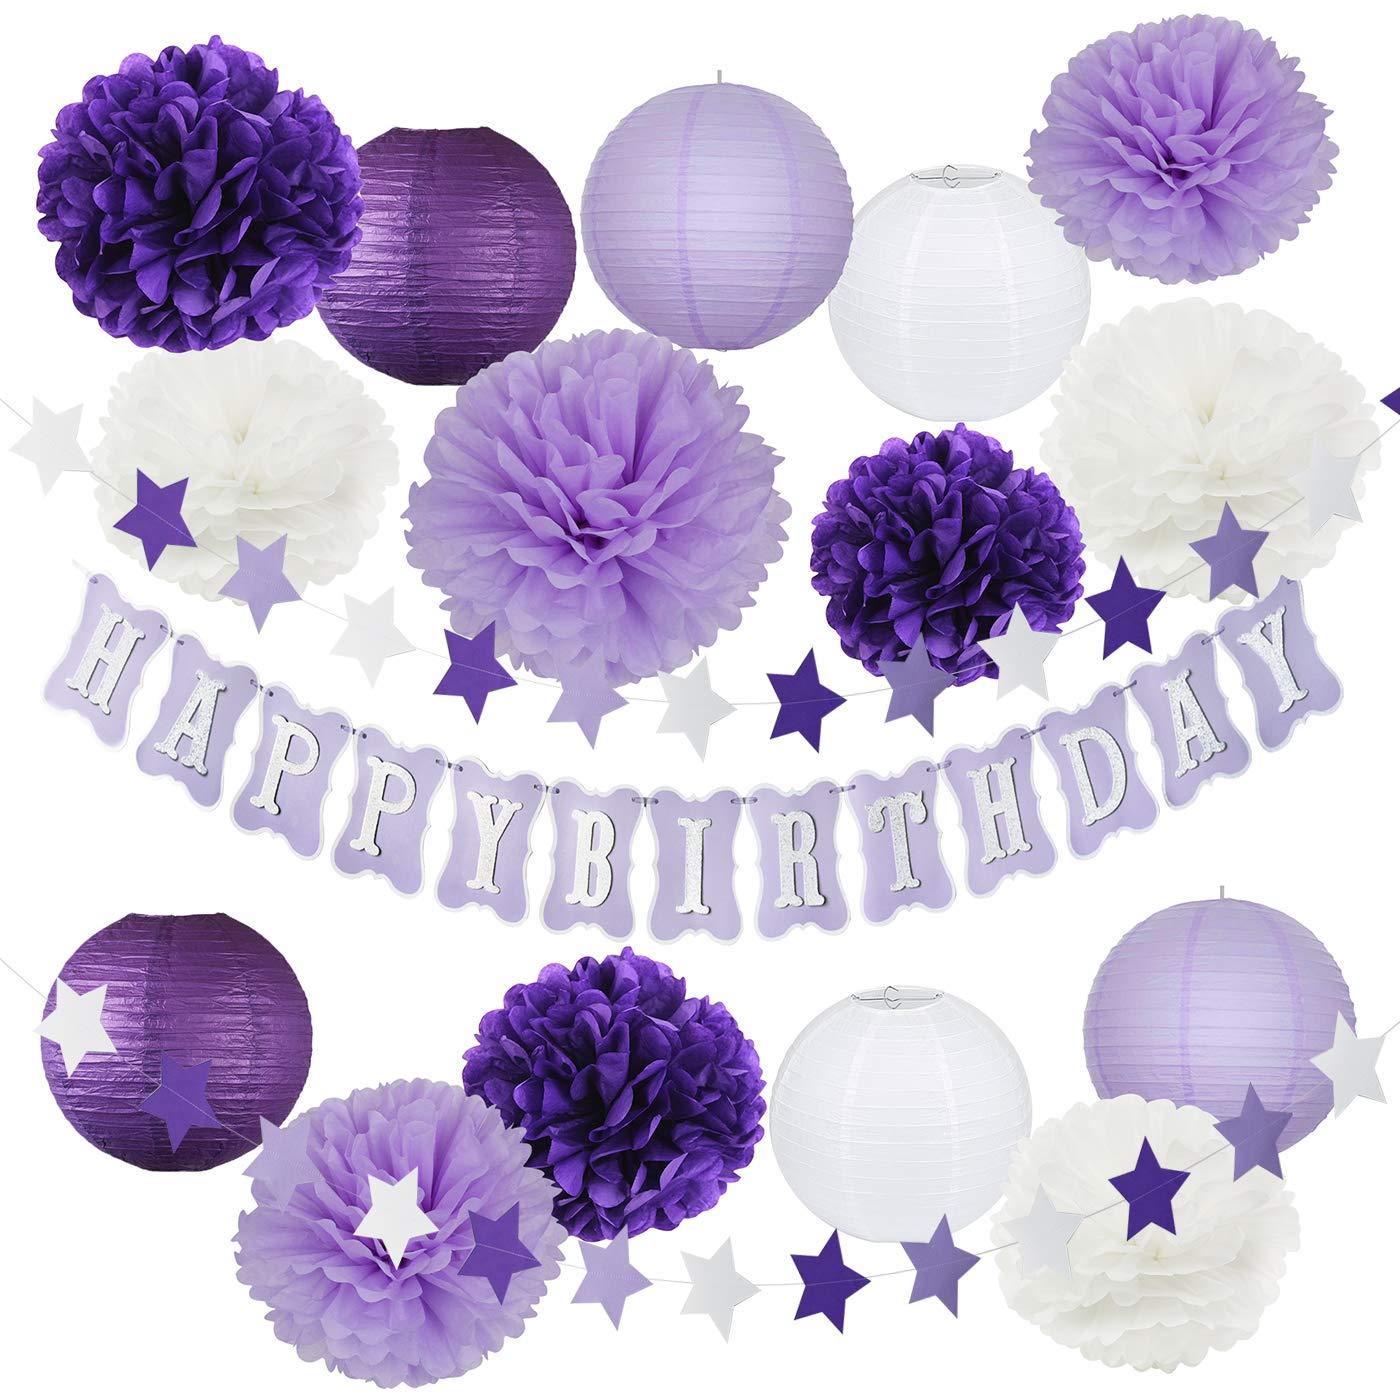 Purple Silver Birthday Party Decorations Happy Birthday Banner Purple Star Garland Tissue Pom Pom Paper Lanterns for Girl Purple Birthday Party Supplies